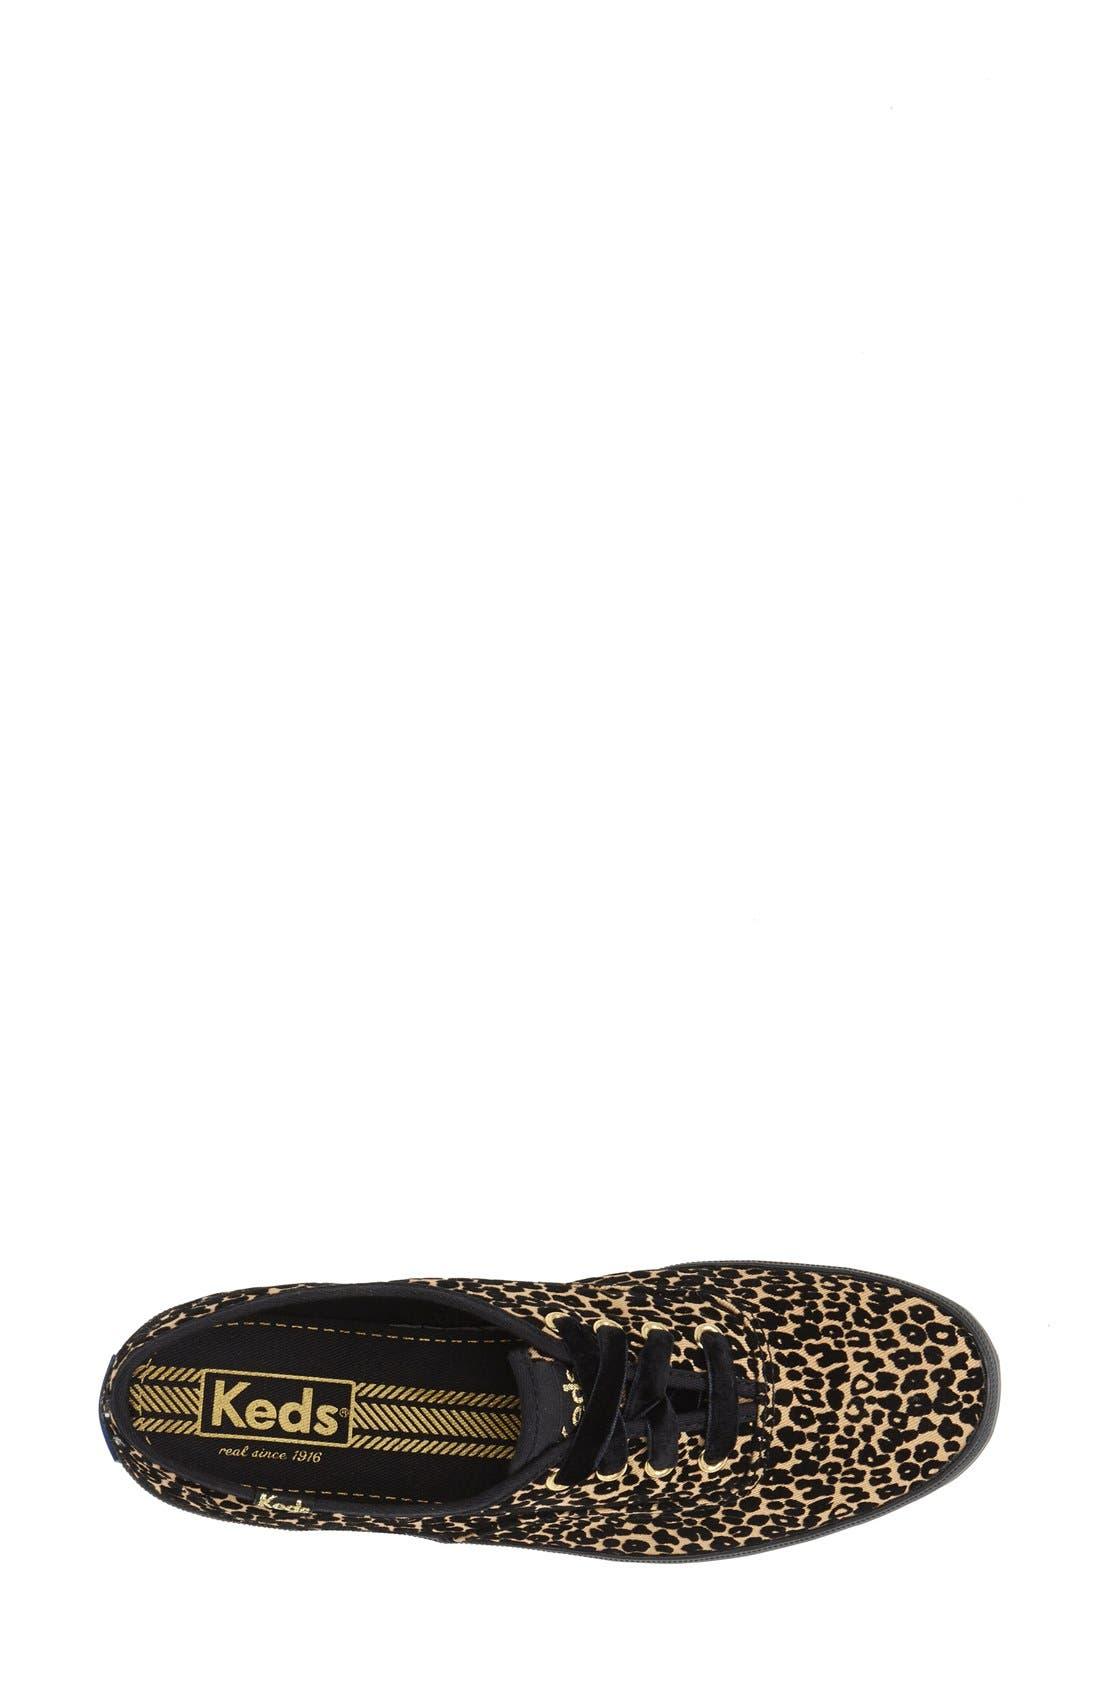 Alternate Image 3  - Keds® 'Champion - Leopard Spot' Sneaker (Women)